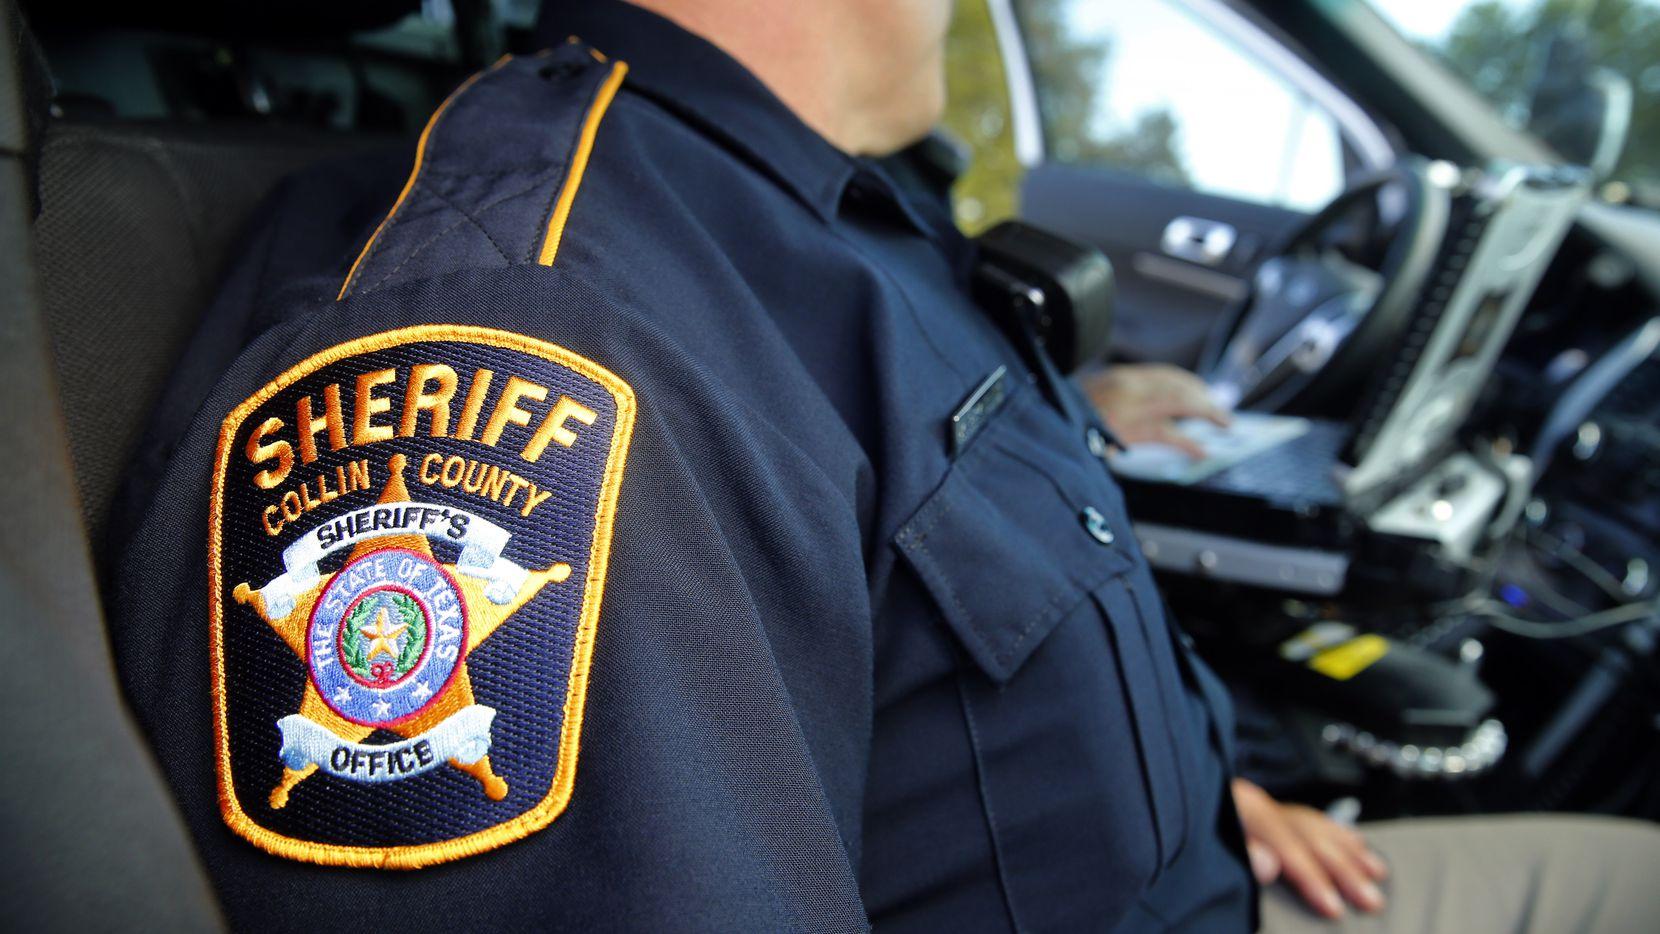 Sean Bartlett and Logan Bridgefarmer were arrested in the case.